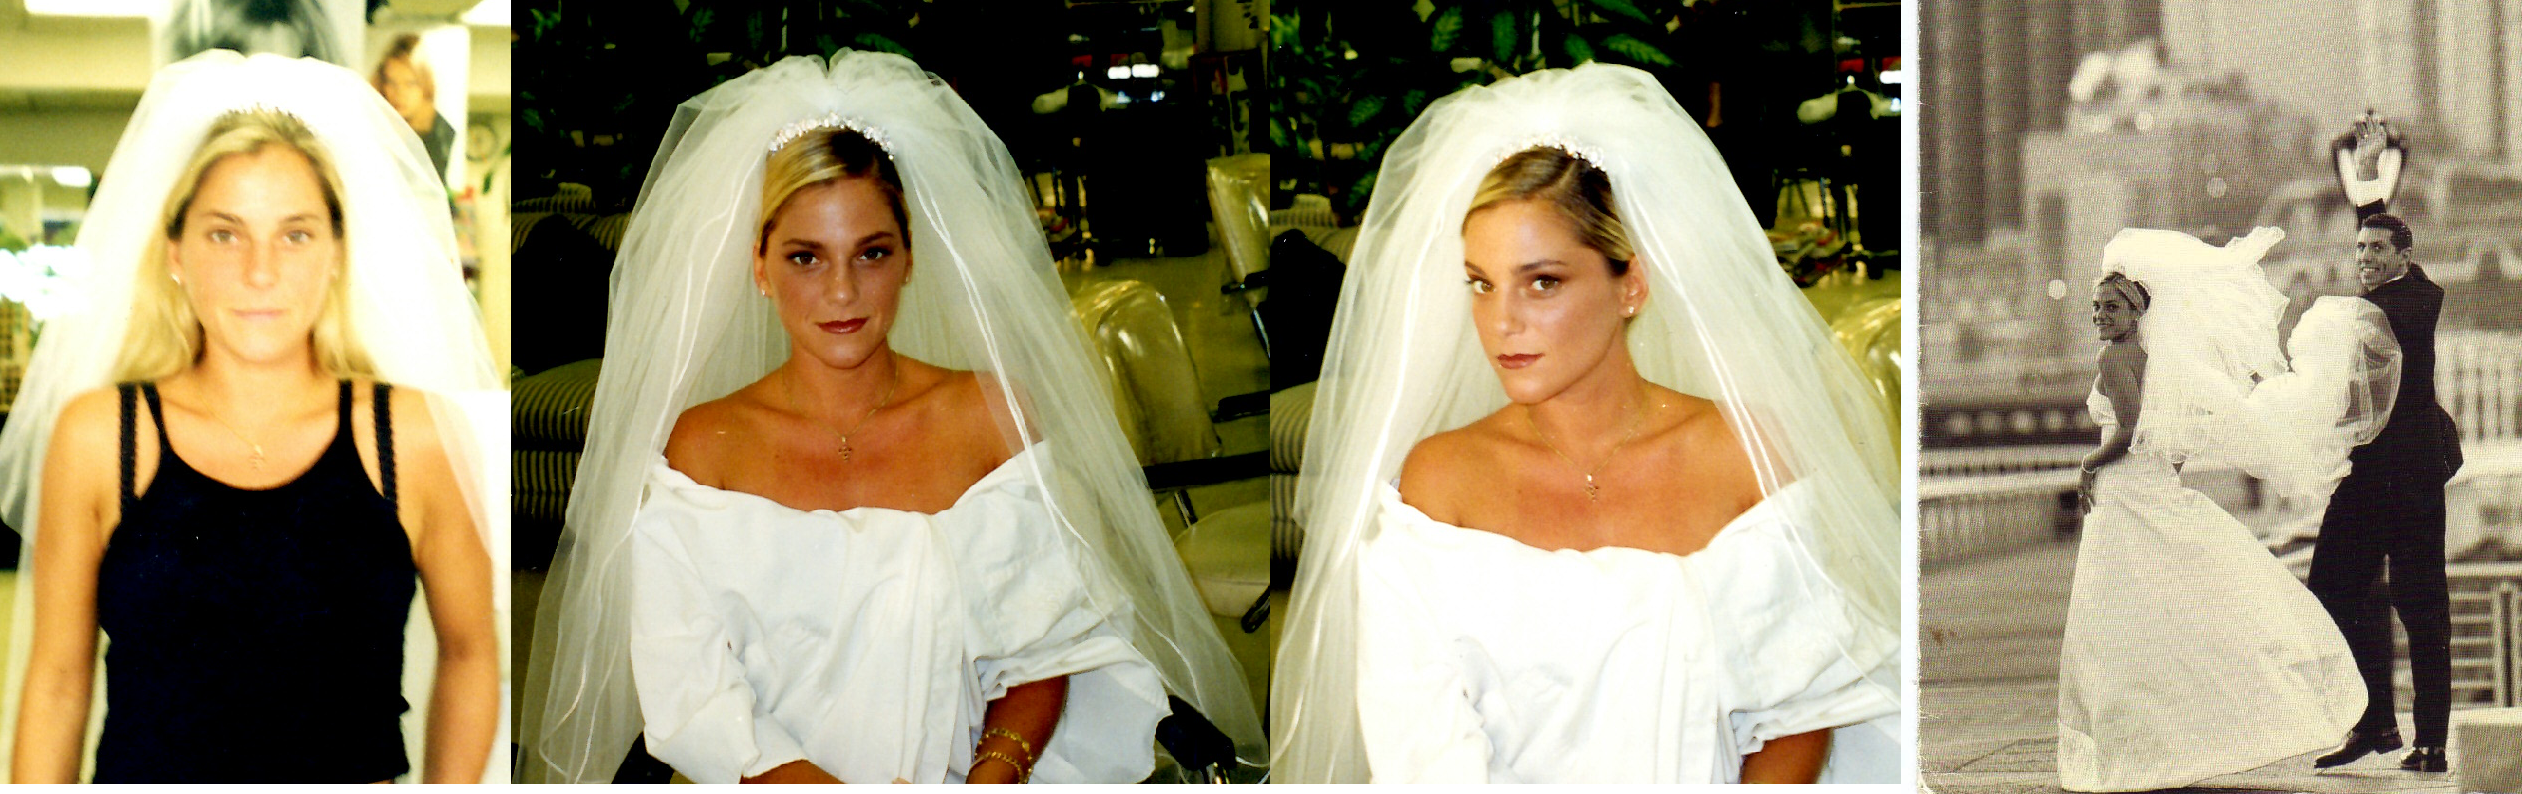 bride 4.png